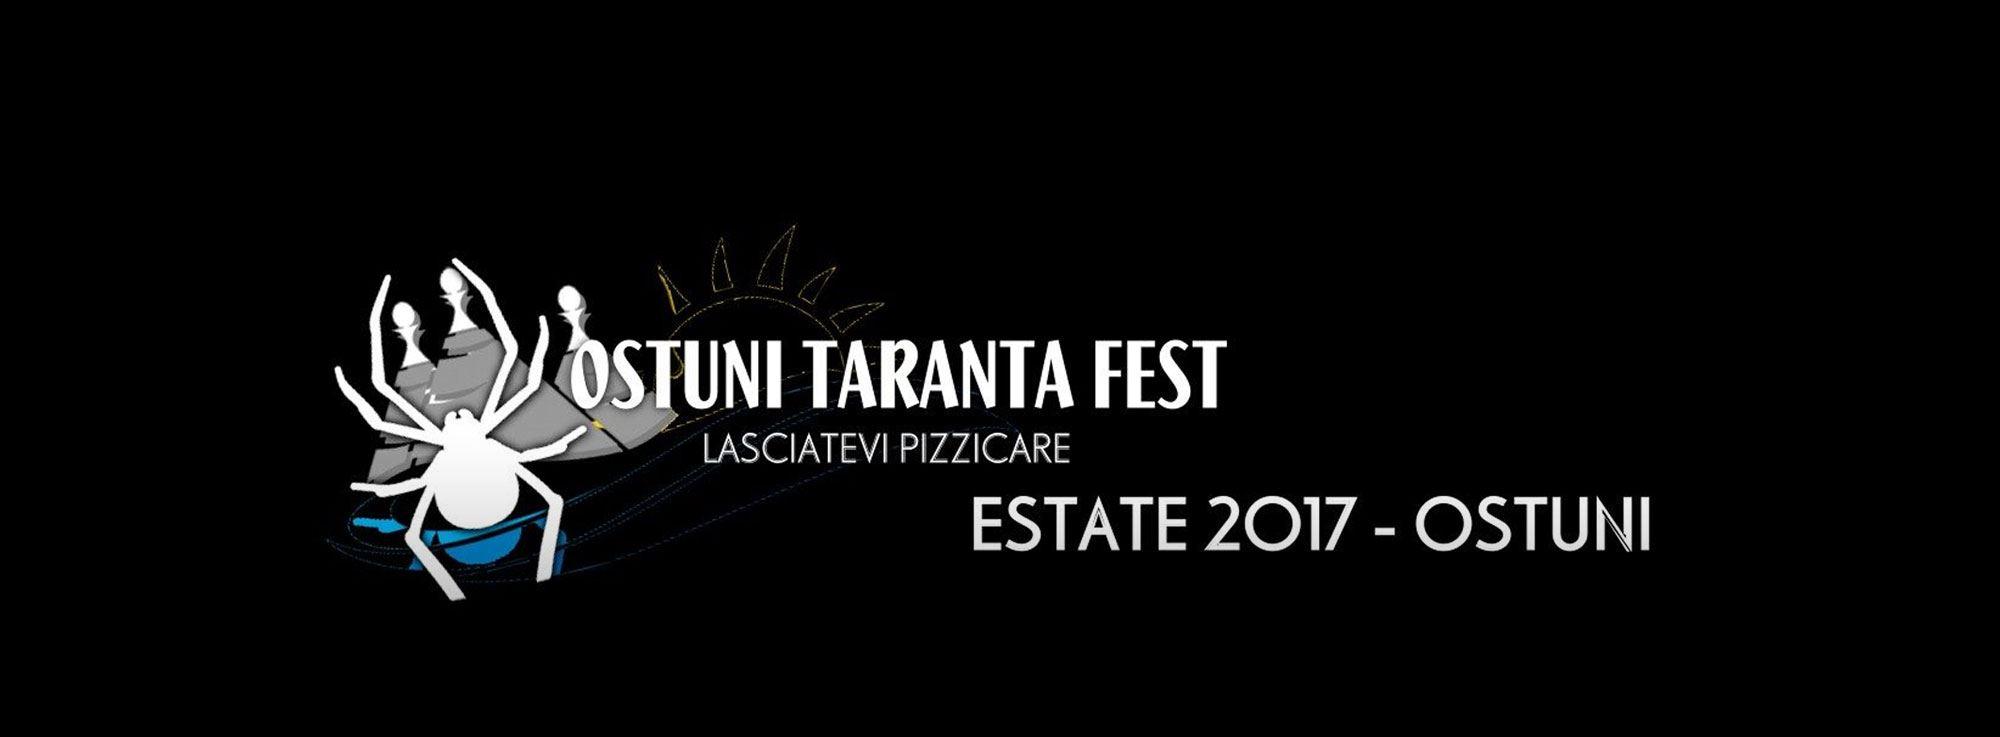 Ostuni: Ostuni Taranta Fest